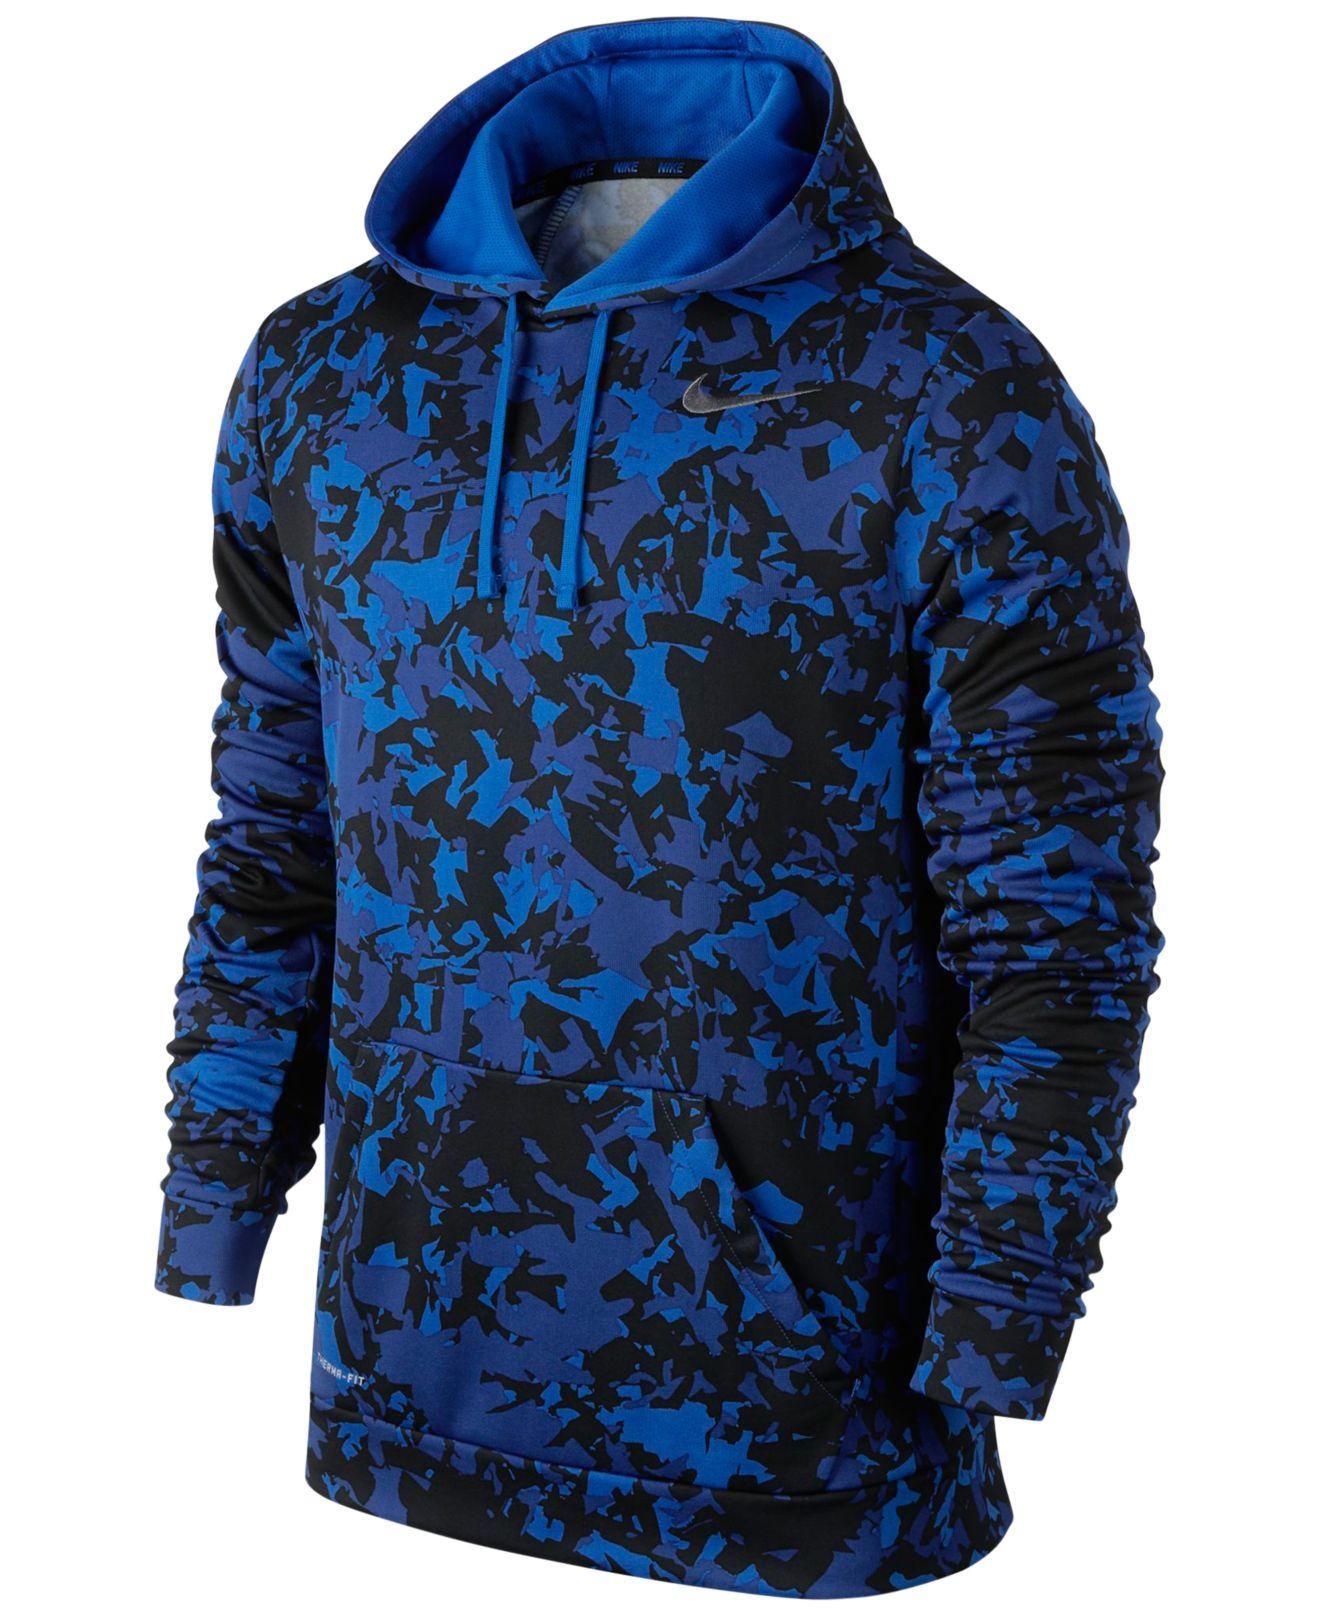 nike ko splinter pullover training hoodie in blue for men. Black Bedroom Furniture Sets. Home Design Ideas